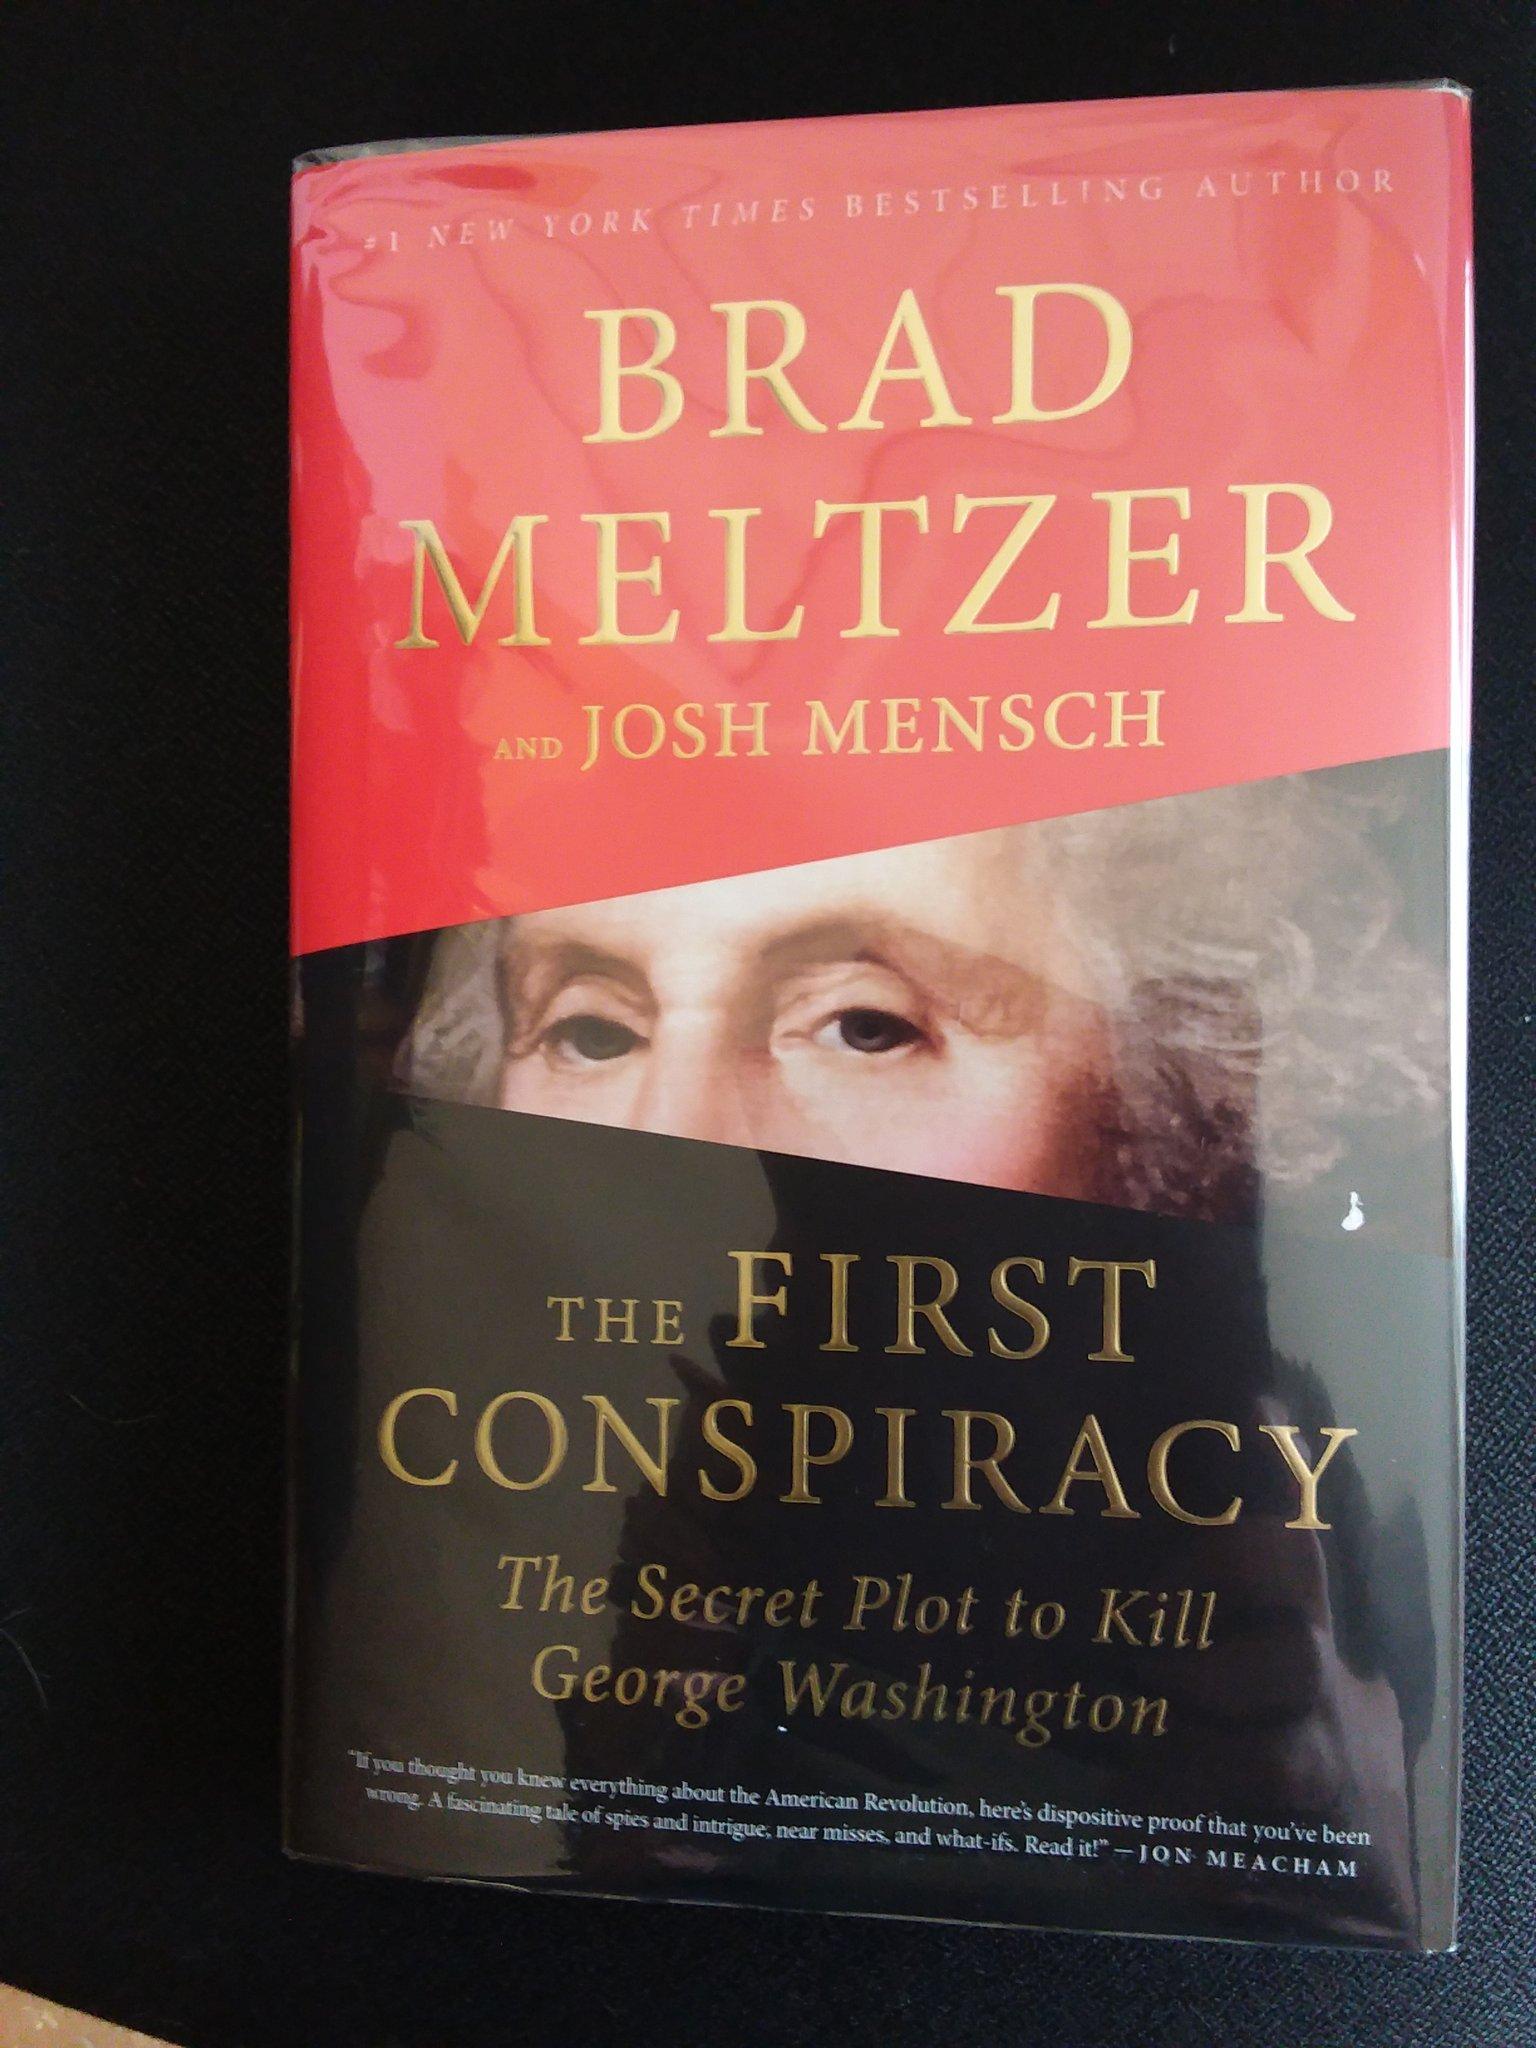 The First Conspiracy The Secret Plot To Kill George Washington